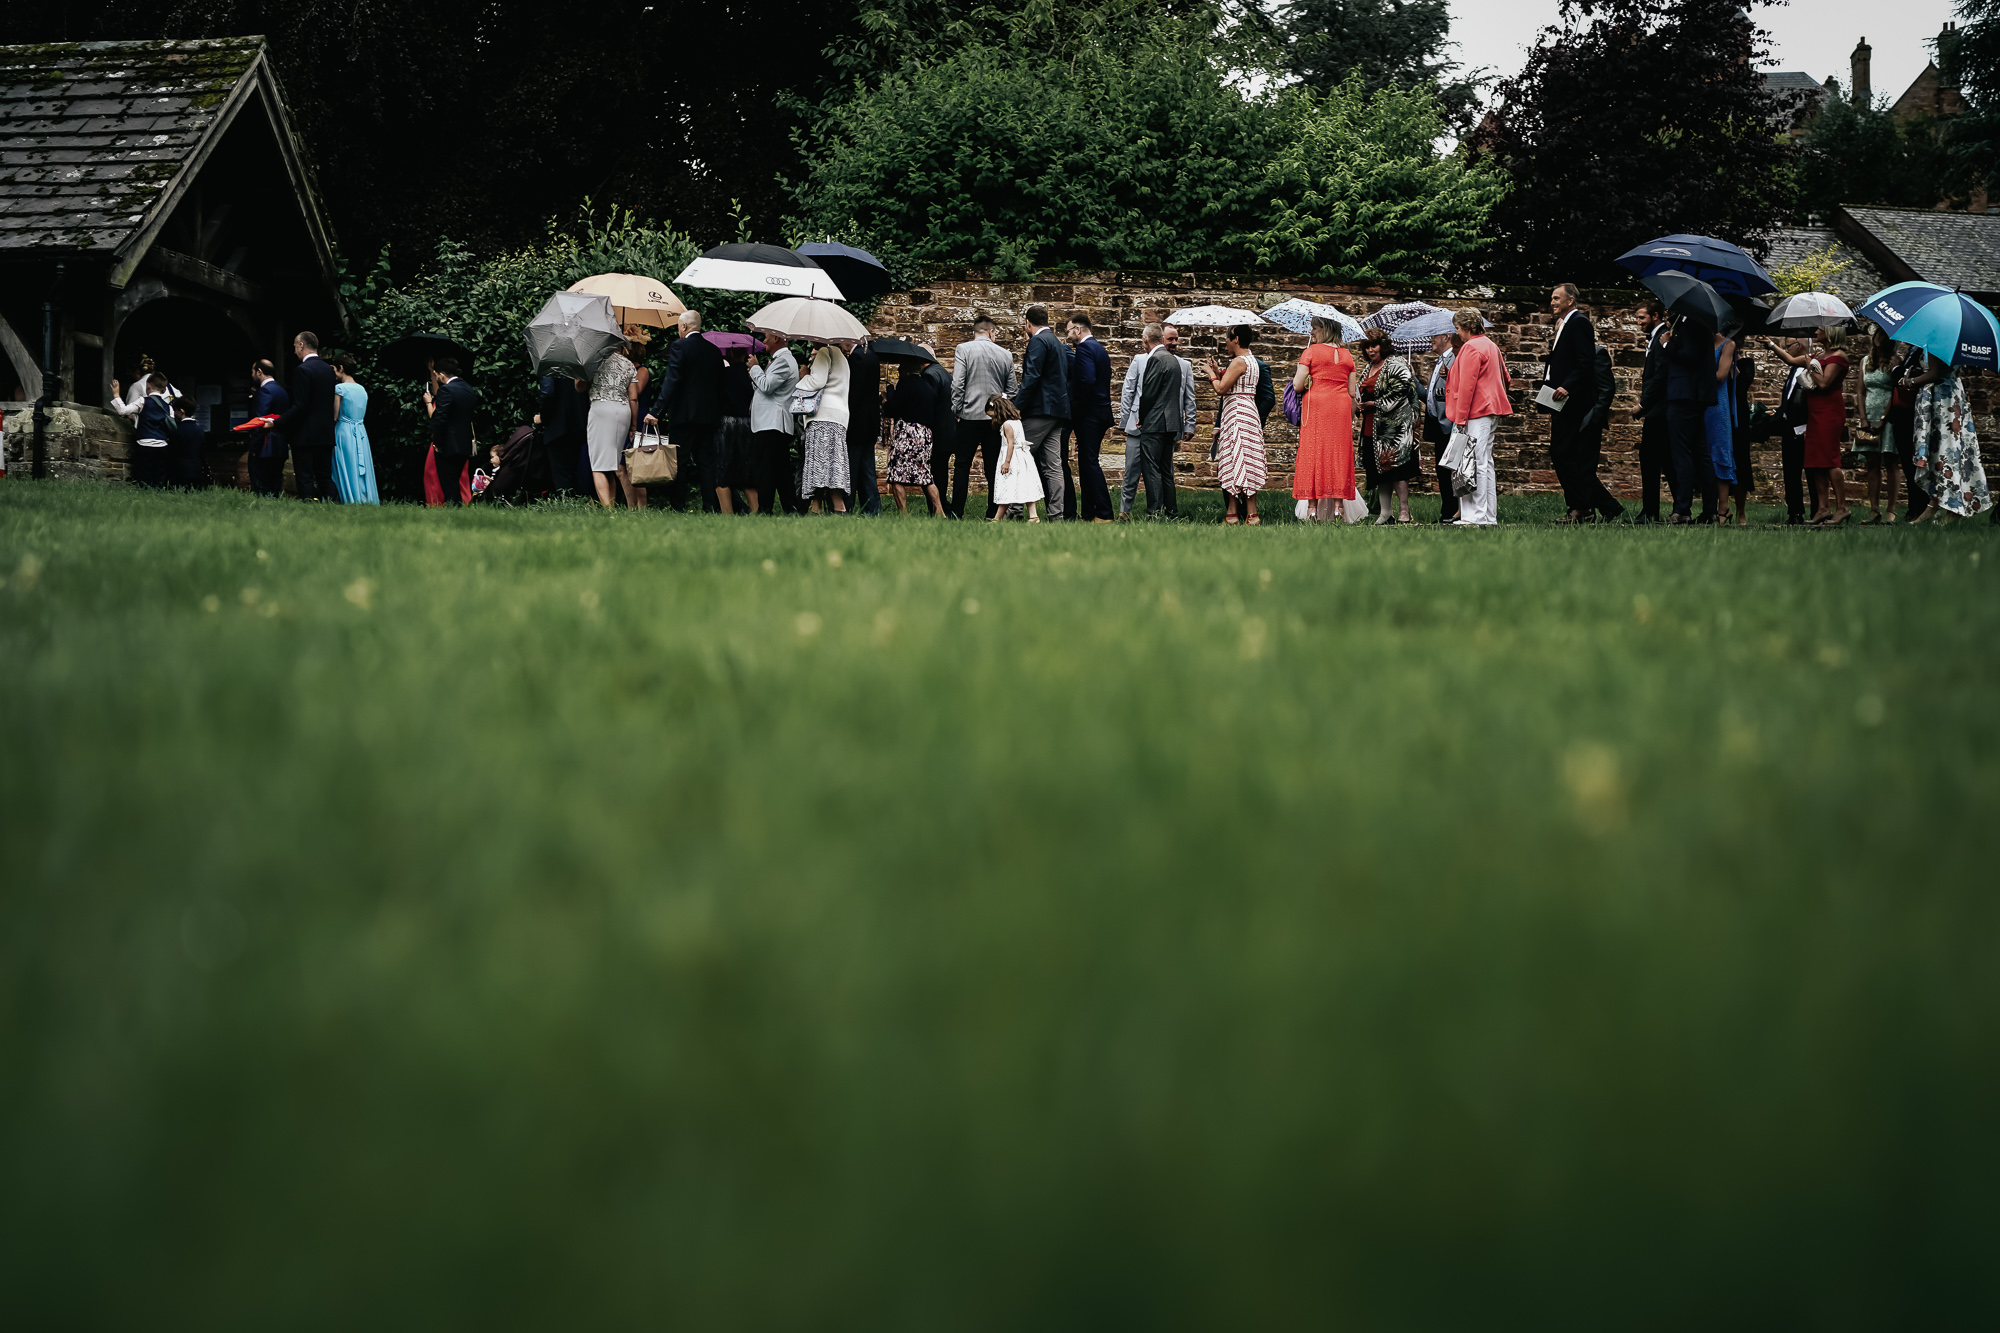 High Barn Wedding photographer lake distect penrith documentry wedding photography (30 of 57).jpg